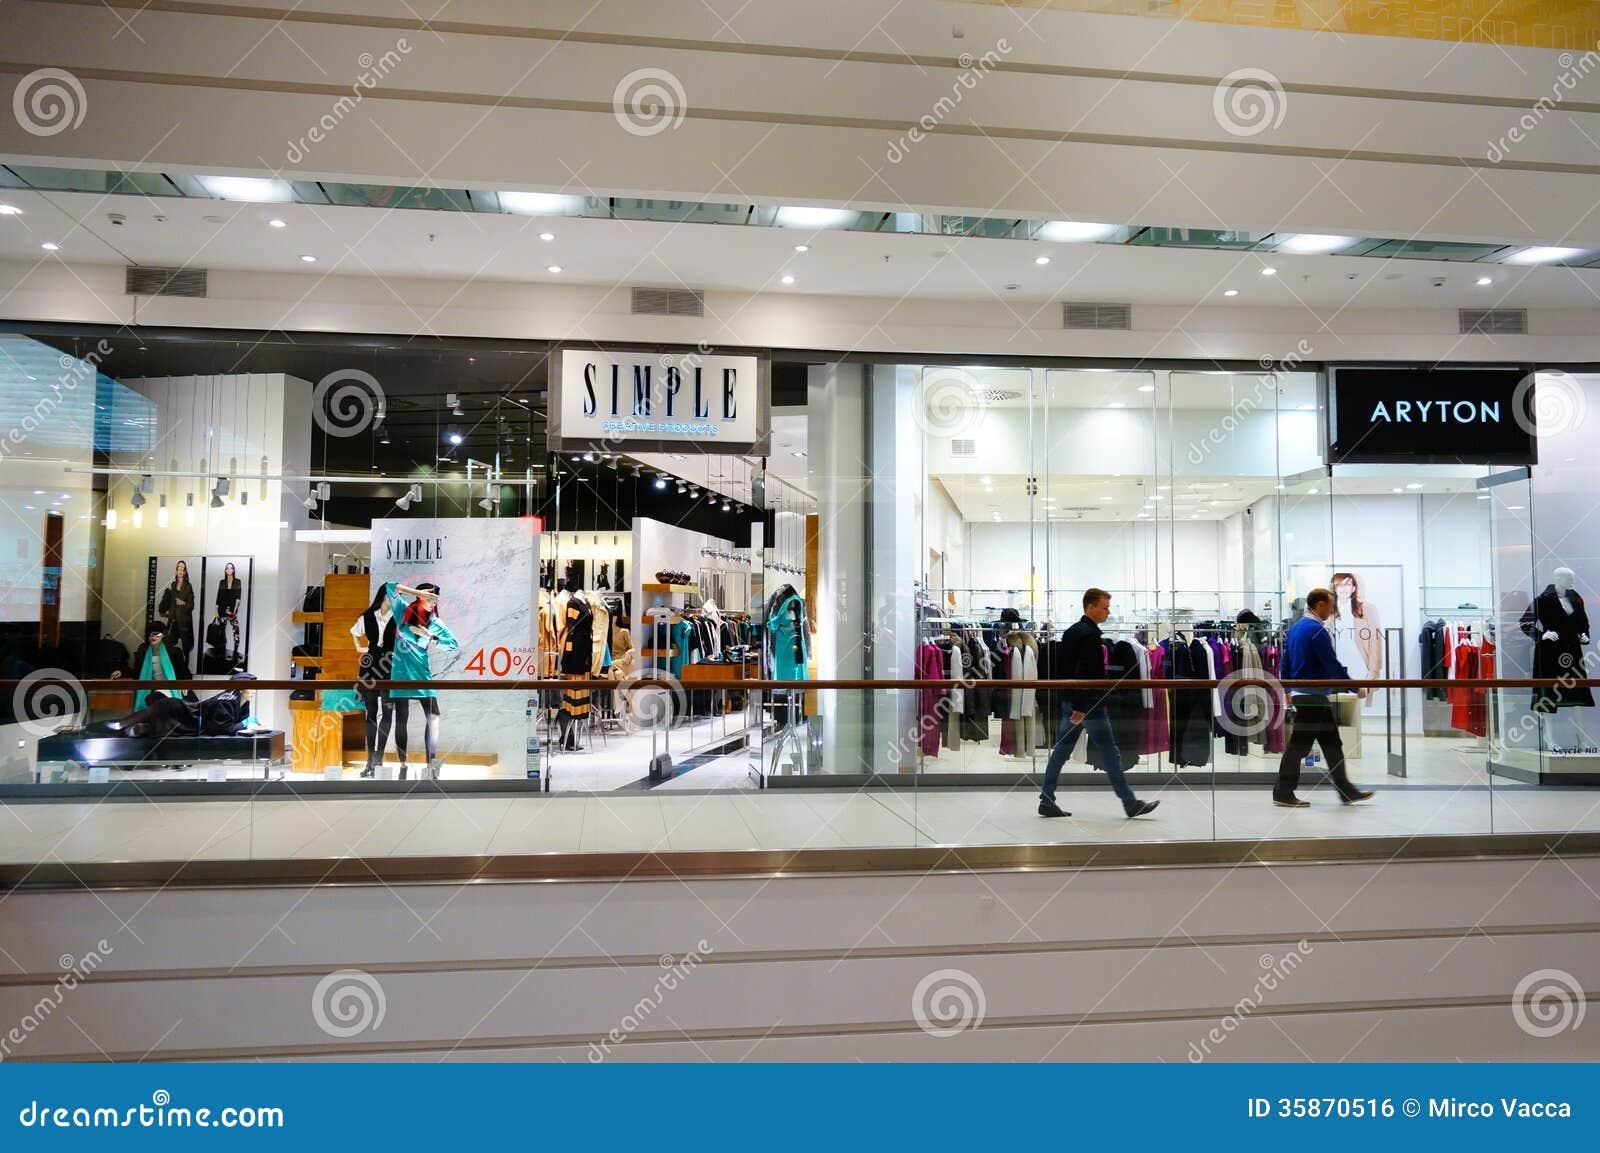 Bayshore mall clothing stores